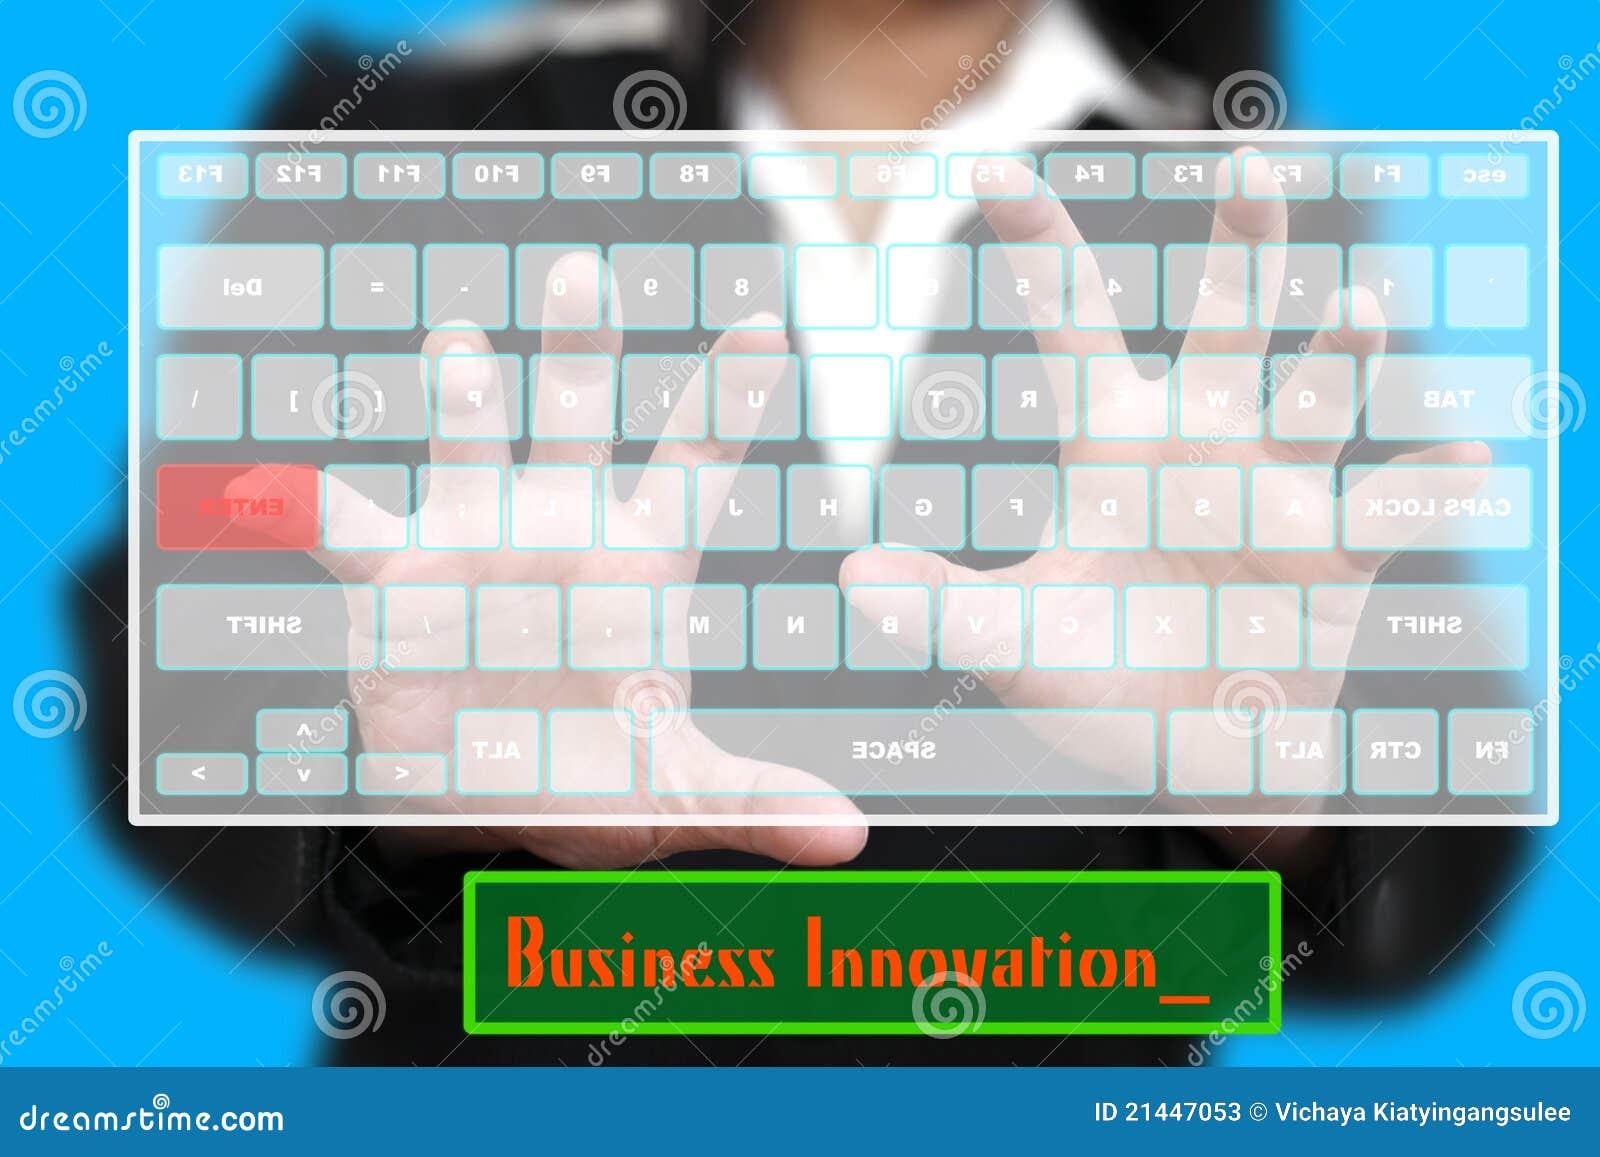 Virtuelle Tastatur Download